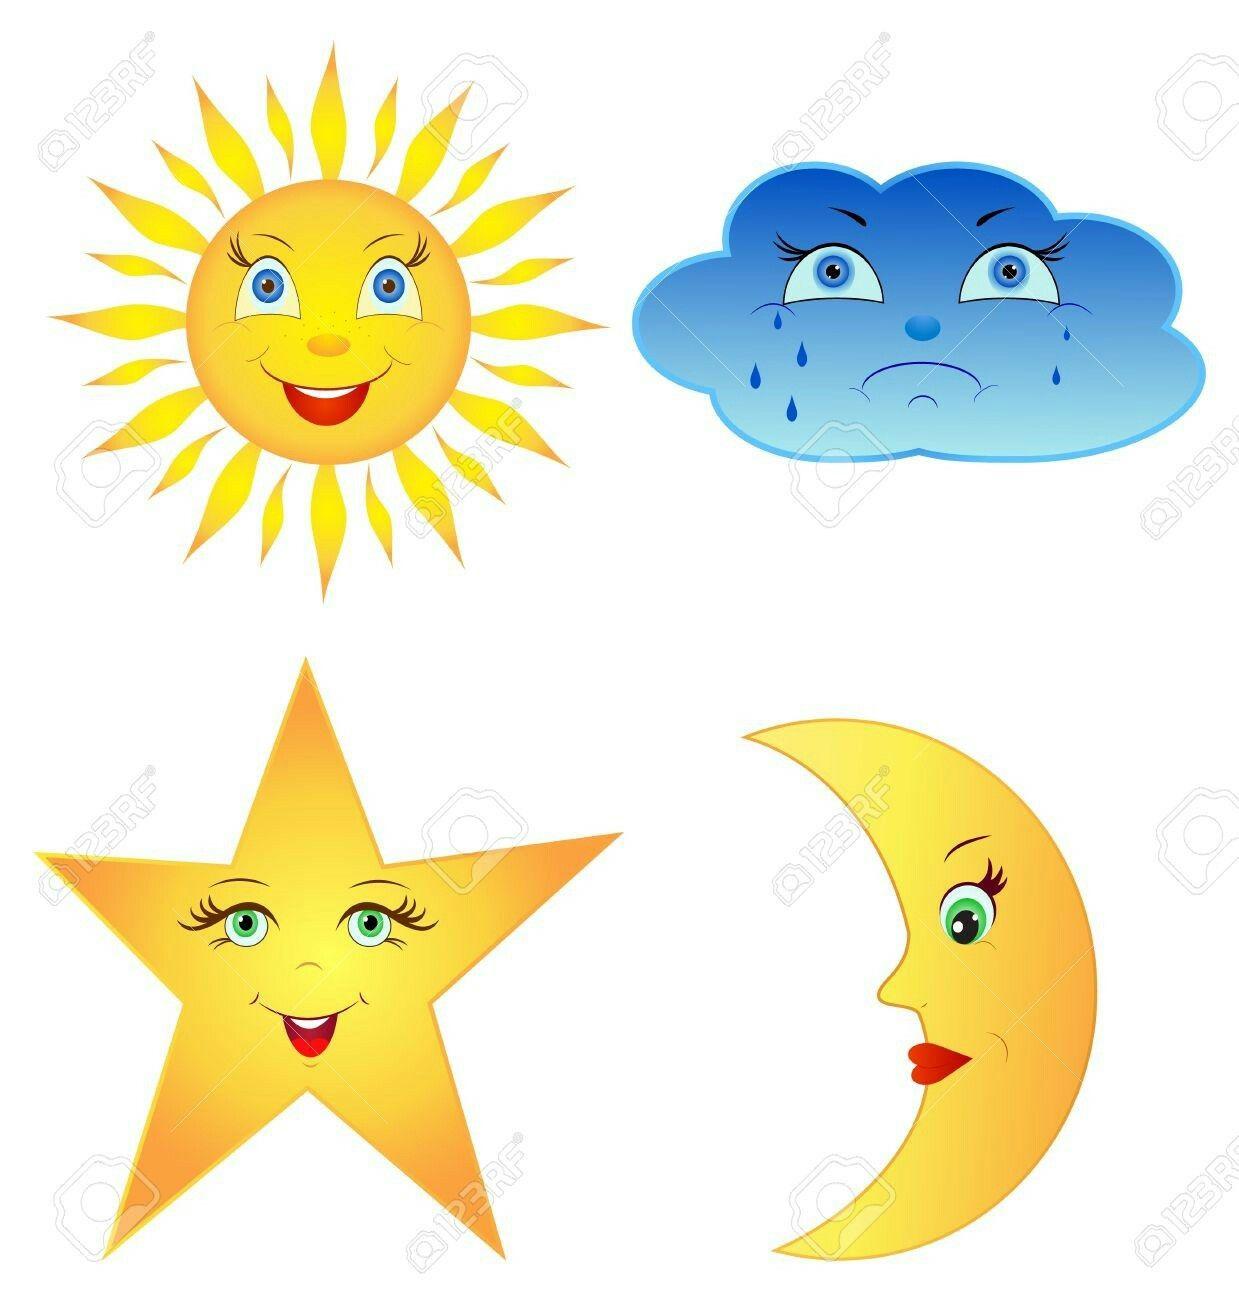 suns, moons, stars and friends」おしゃれまとめの人気アイデア